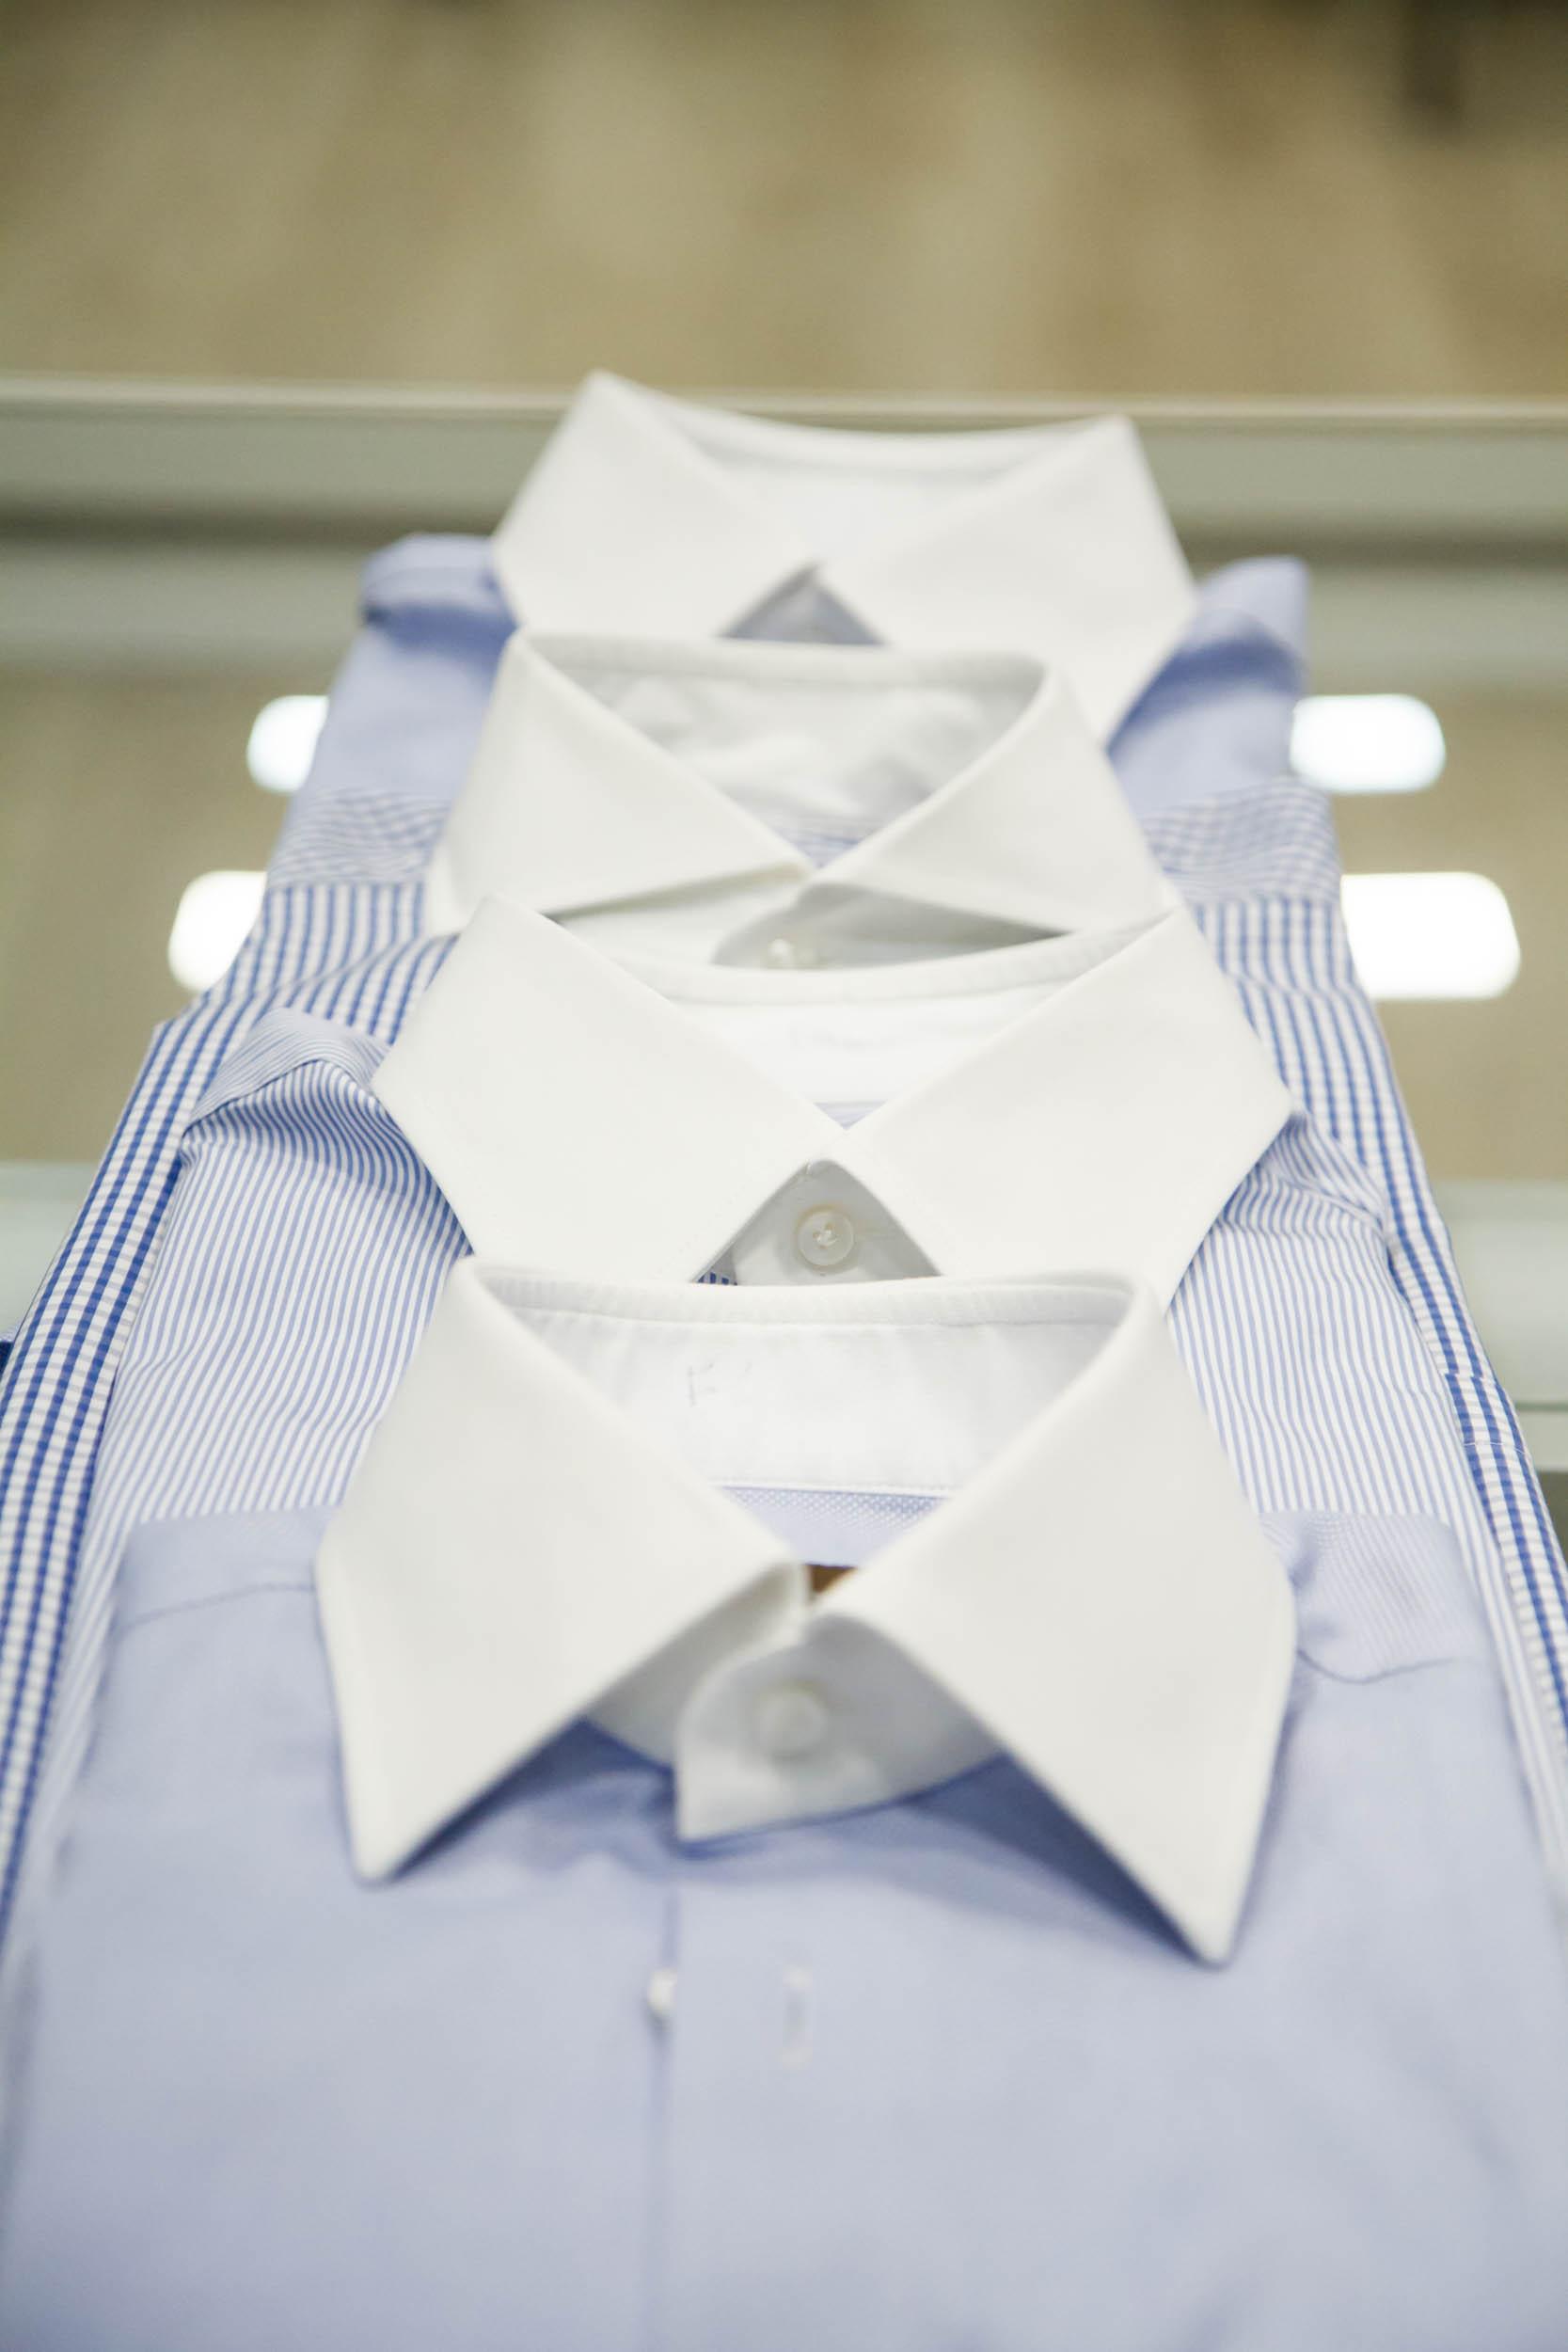 get cheap 9cd0a a7935 Camicie su Misura – Bespoke Shirts – Sartoria – Fabio Sodano